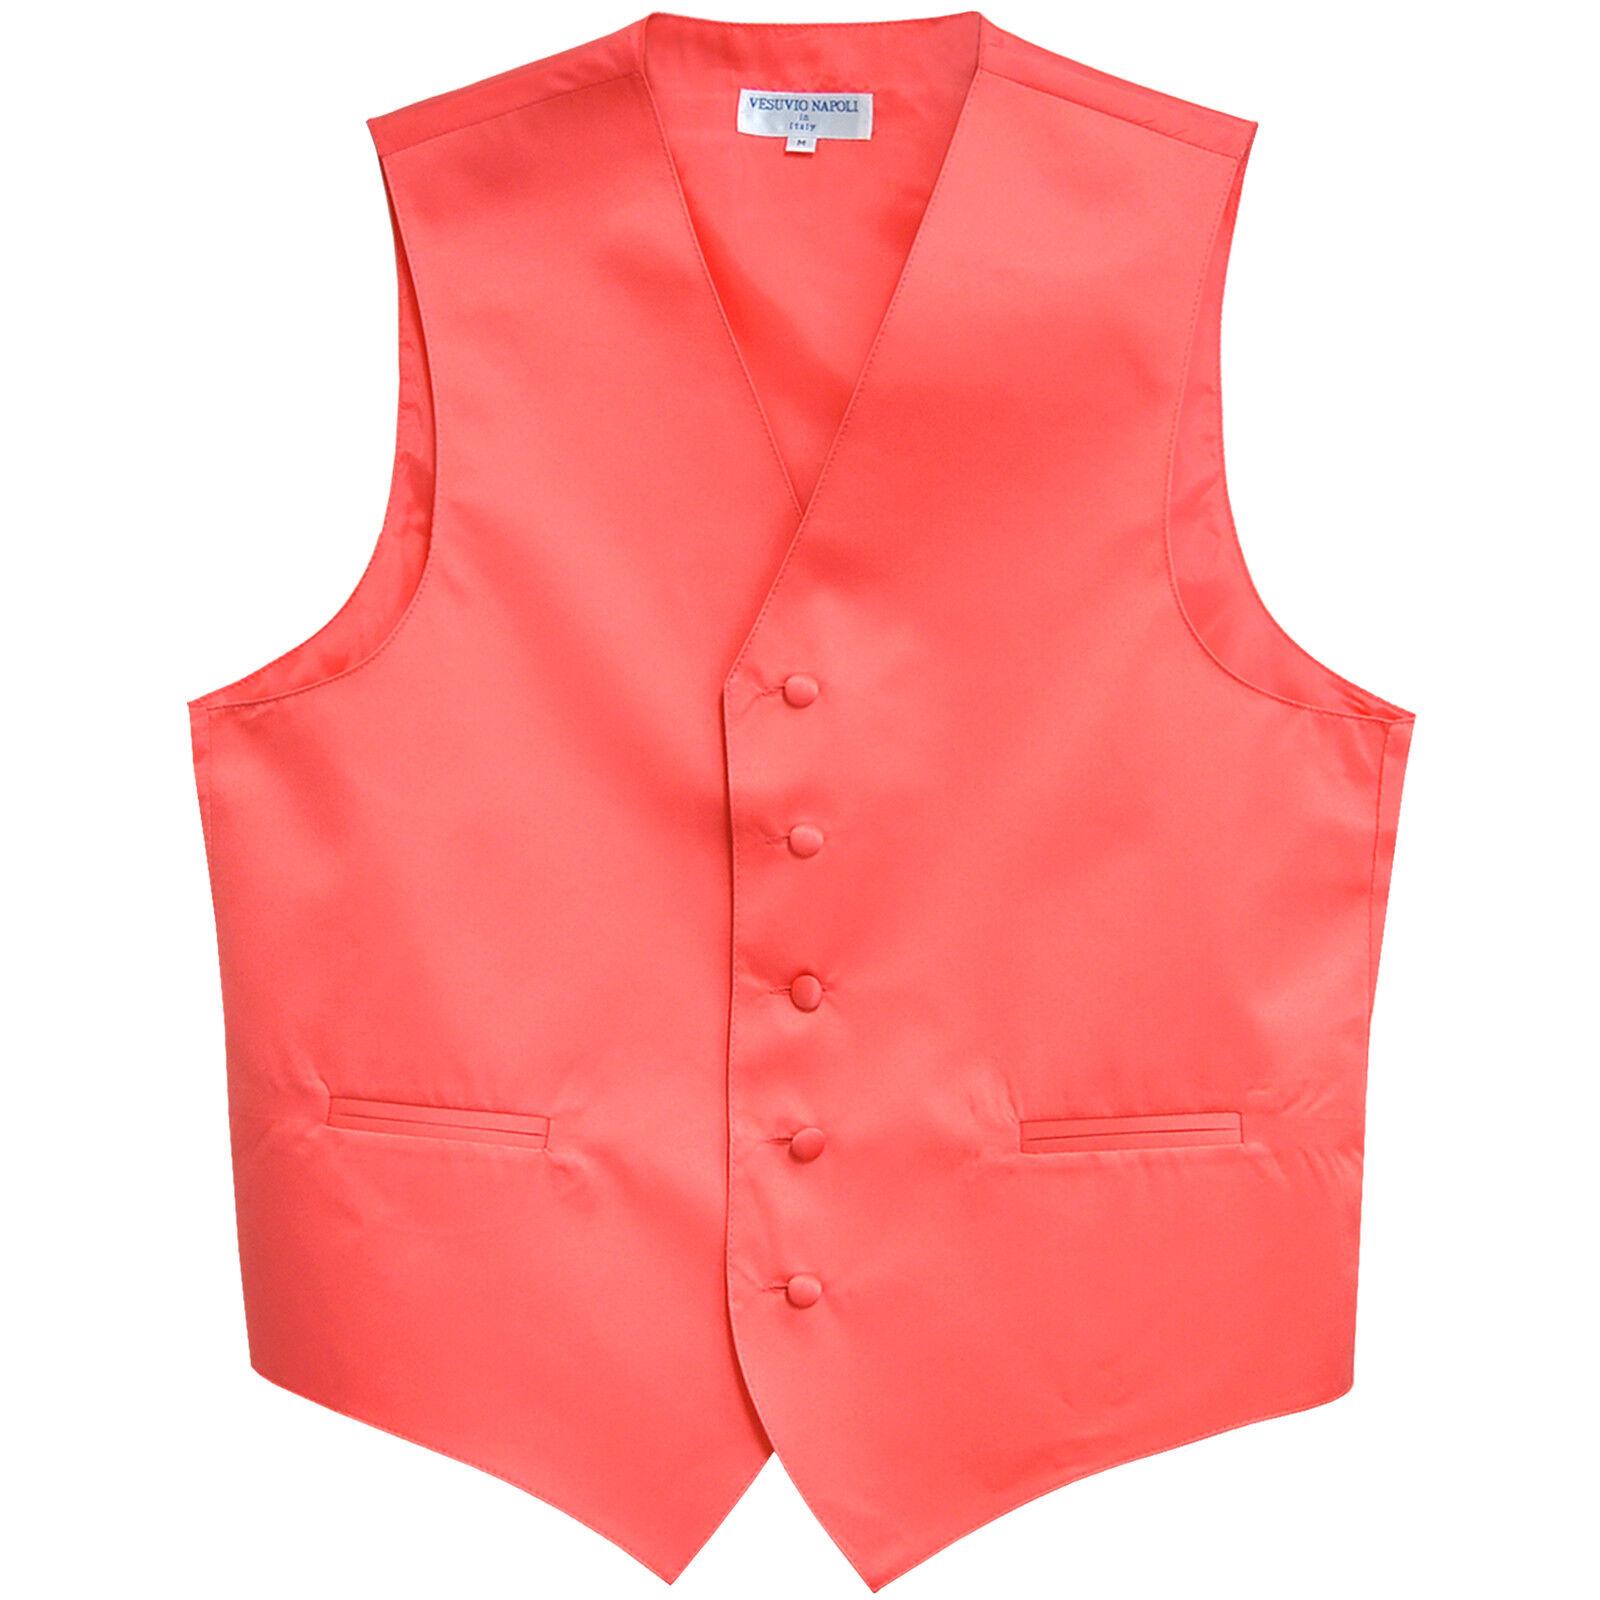 New Men's Vesuvio Napoli Tuxedo Vest Waistcoat only prom wedding Coral 5XL 6XL